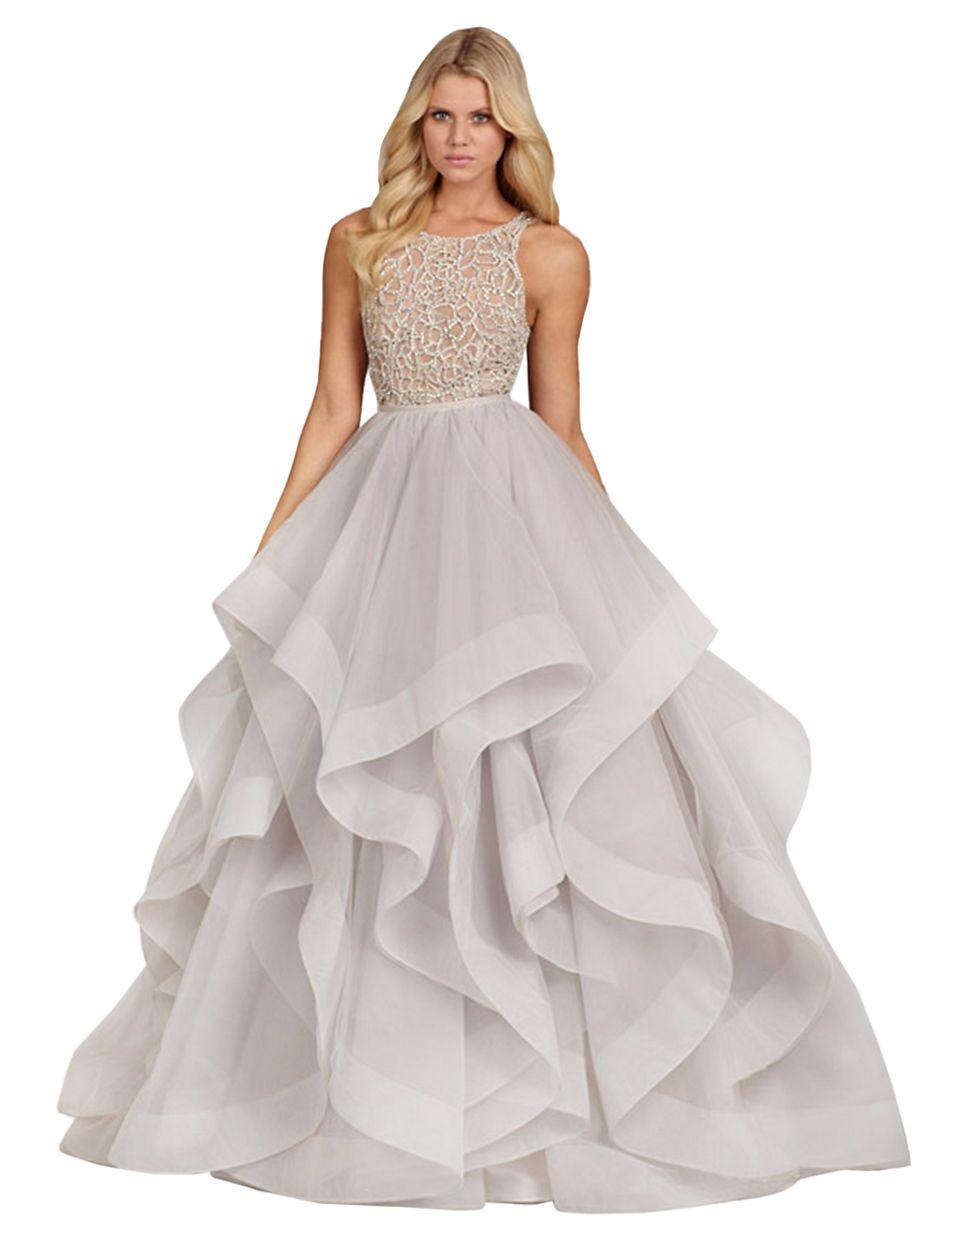 Dori Ball Gown by Hayley nPaige | Hudson\'s Bay. #wedding #dress ...